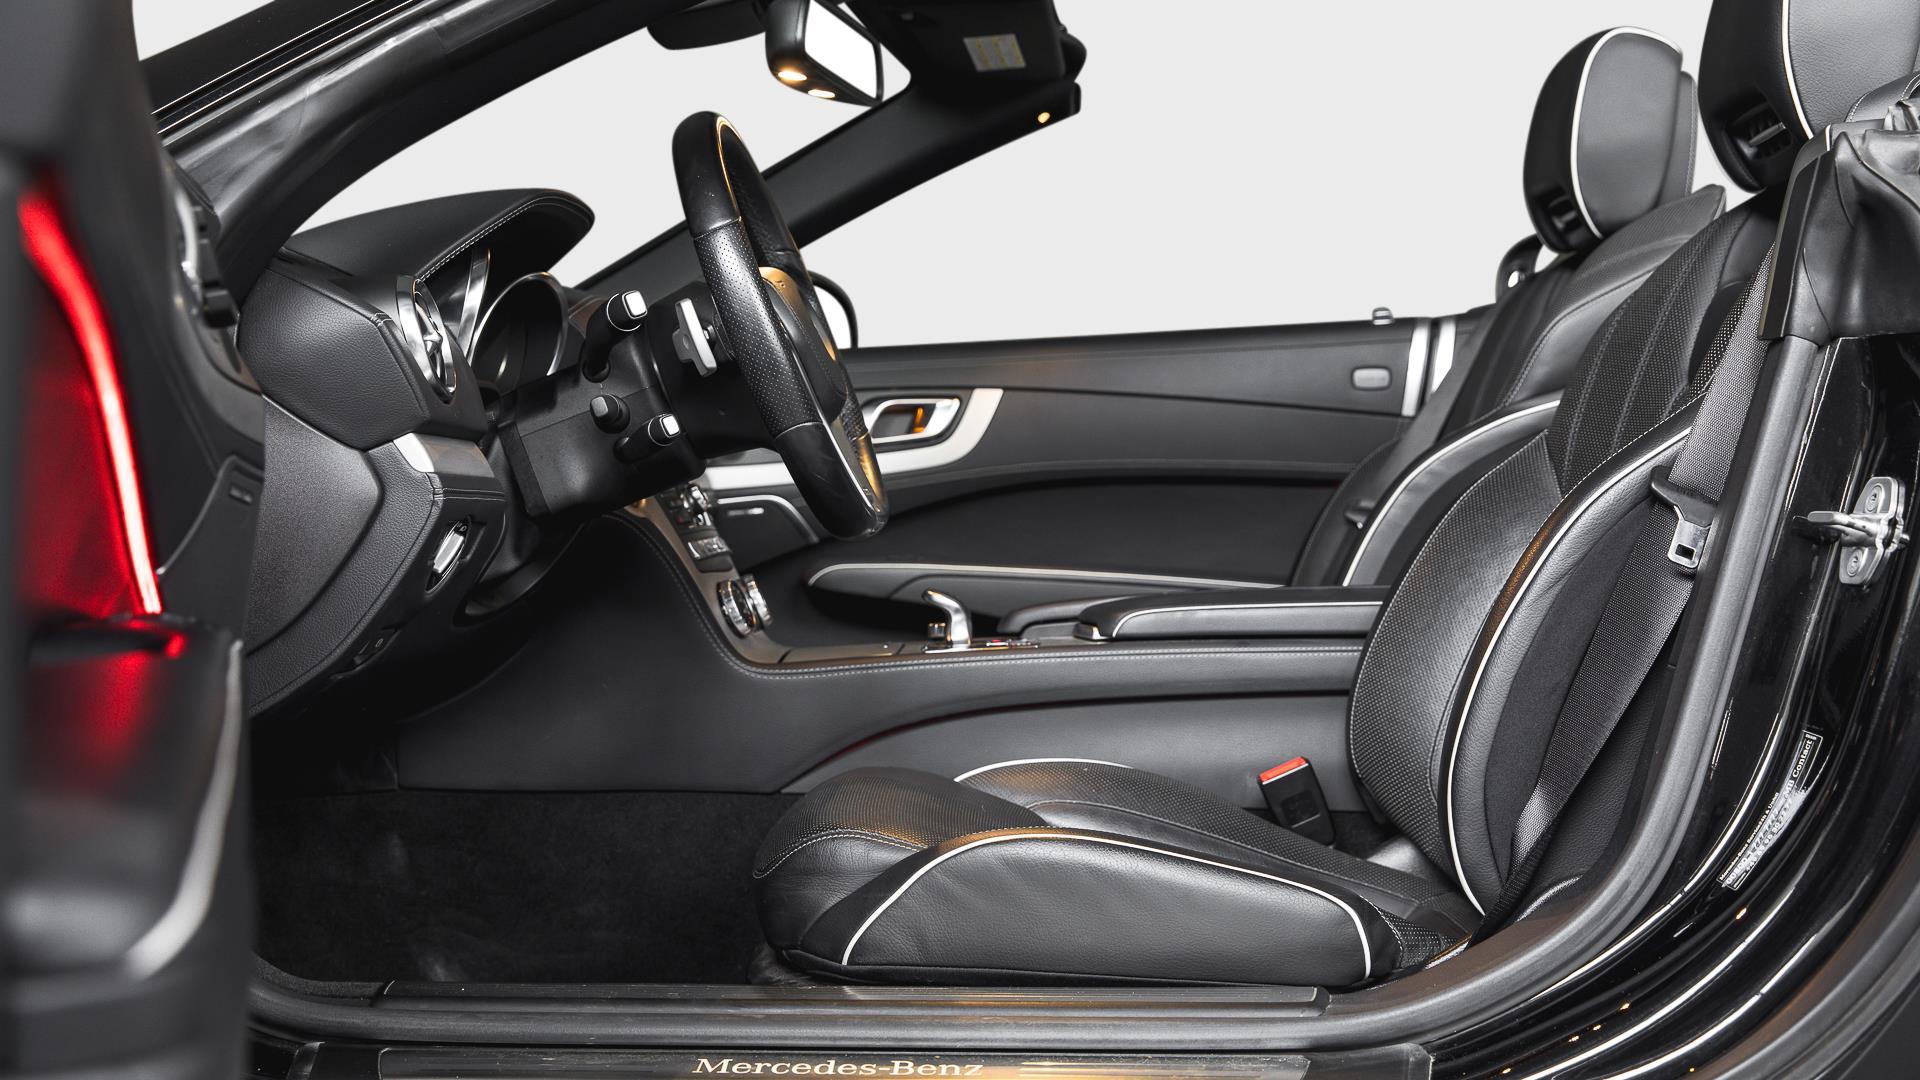 Billede af Mercedes-Benz SL500 4,7 7G-Tronic Plus 435HK Cabr. 7g Aut.